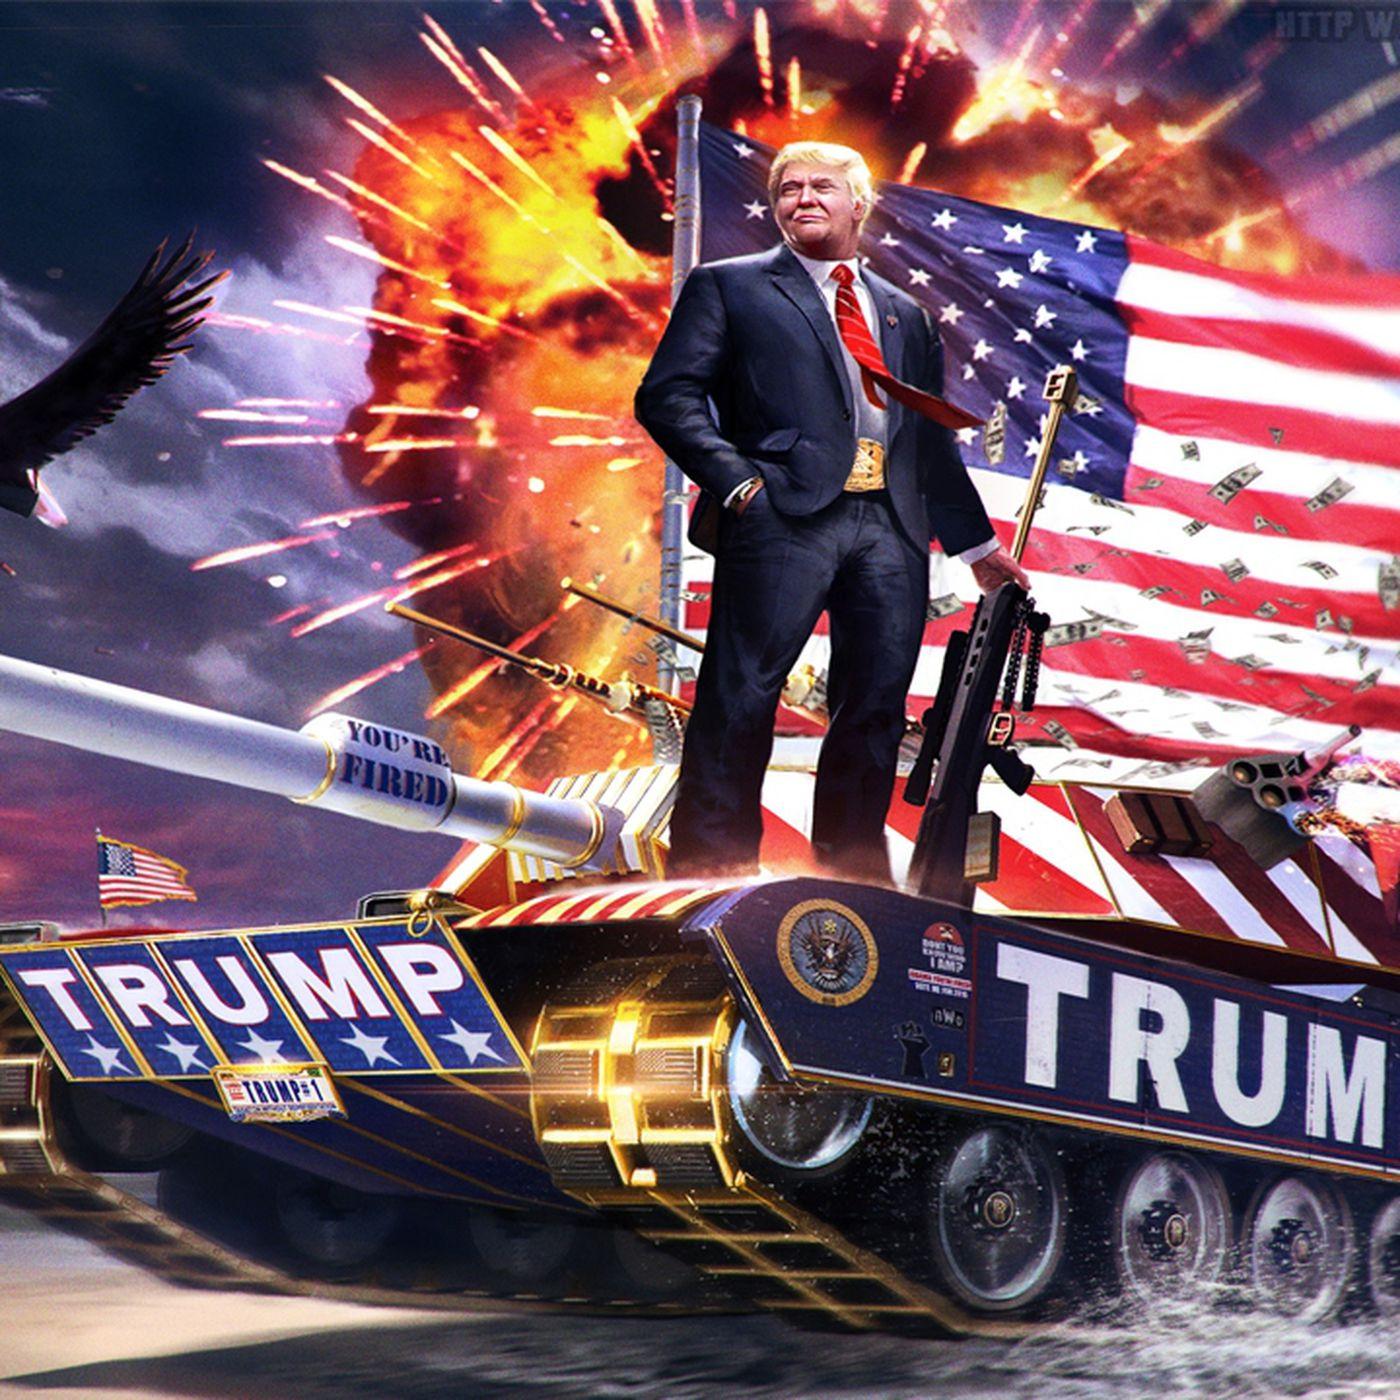 Trump Grabbing America Vinyl Decal Sticker Funny Political Donald The Don Gun